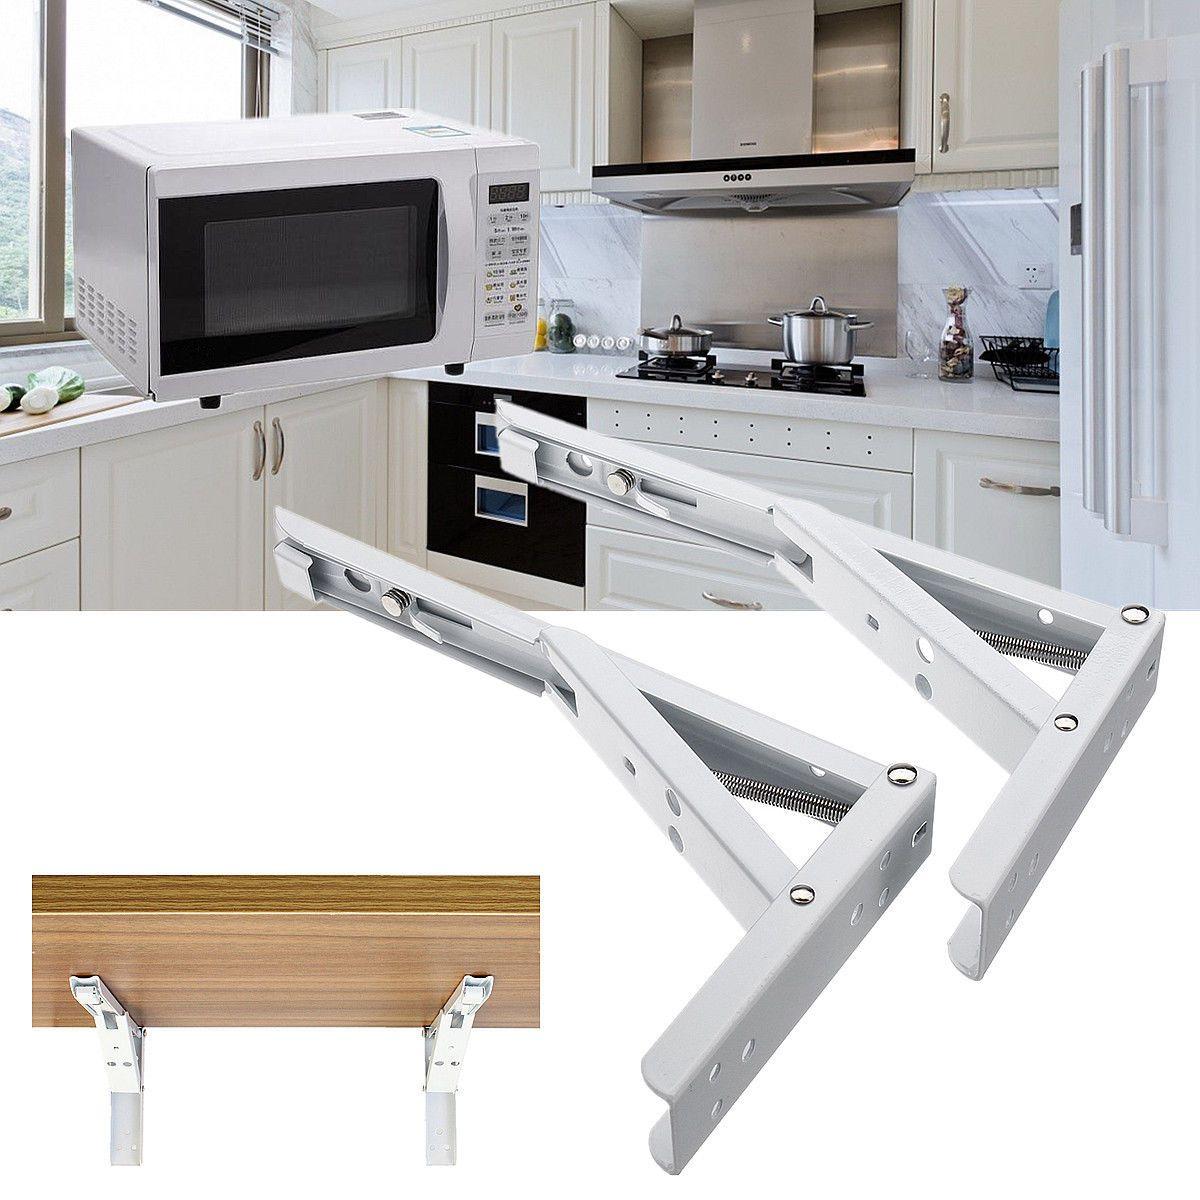 2pcs Microwave Ovens Wall Mounted Triangle Spring Folding Shelf